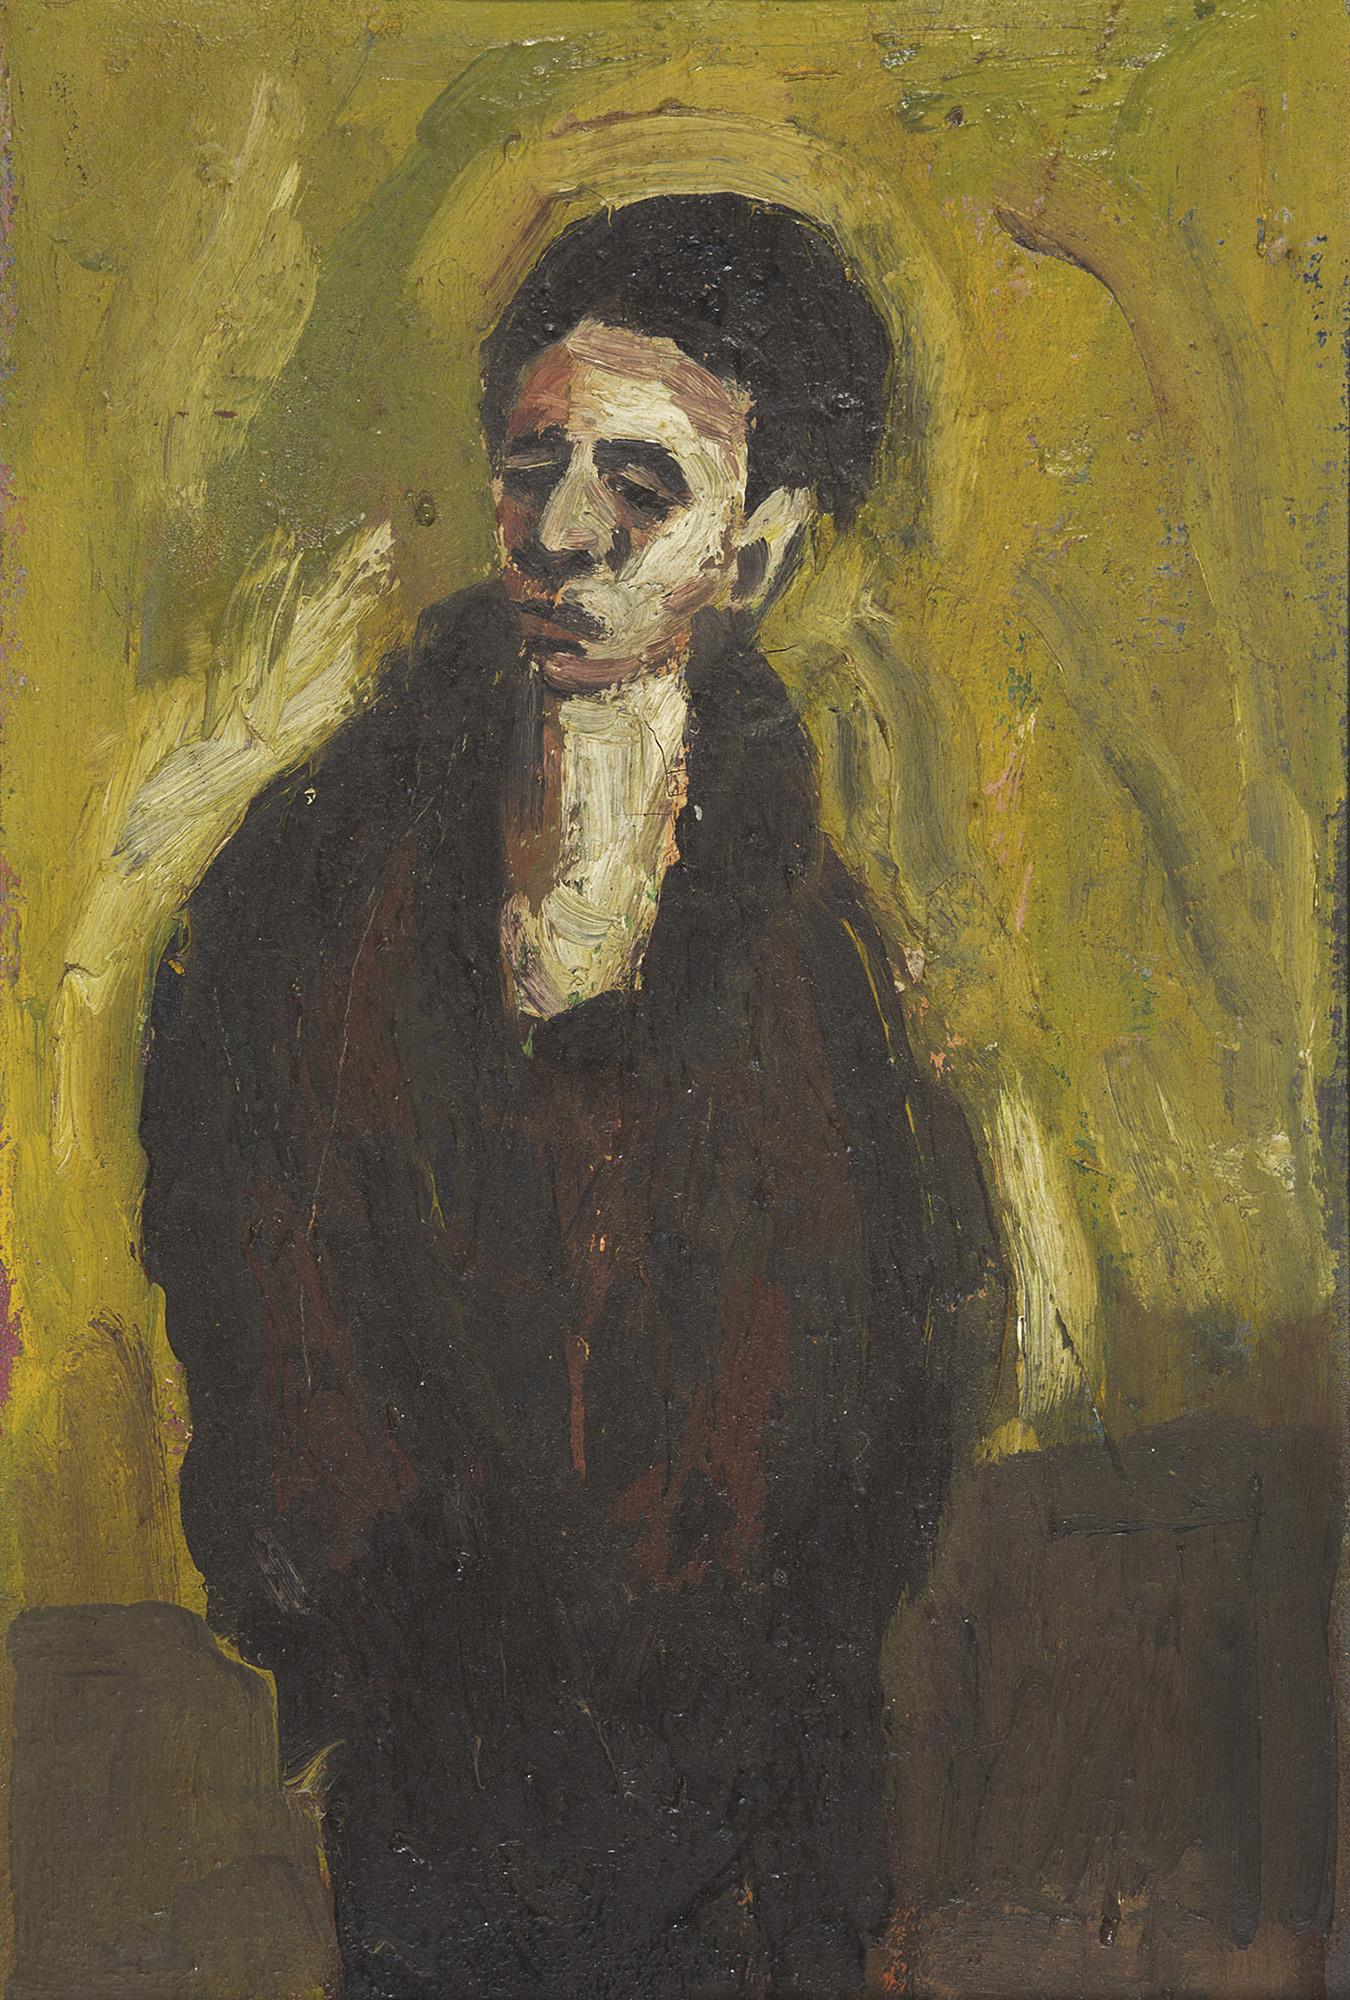 Brett Whiteley, (1939-1992), Figure Of A Young Man 1958, oil on board